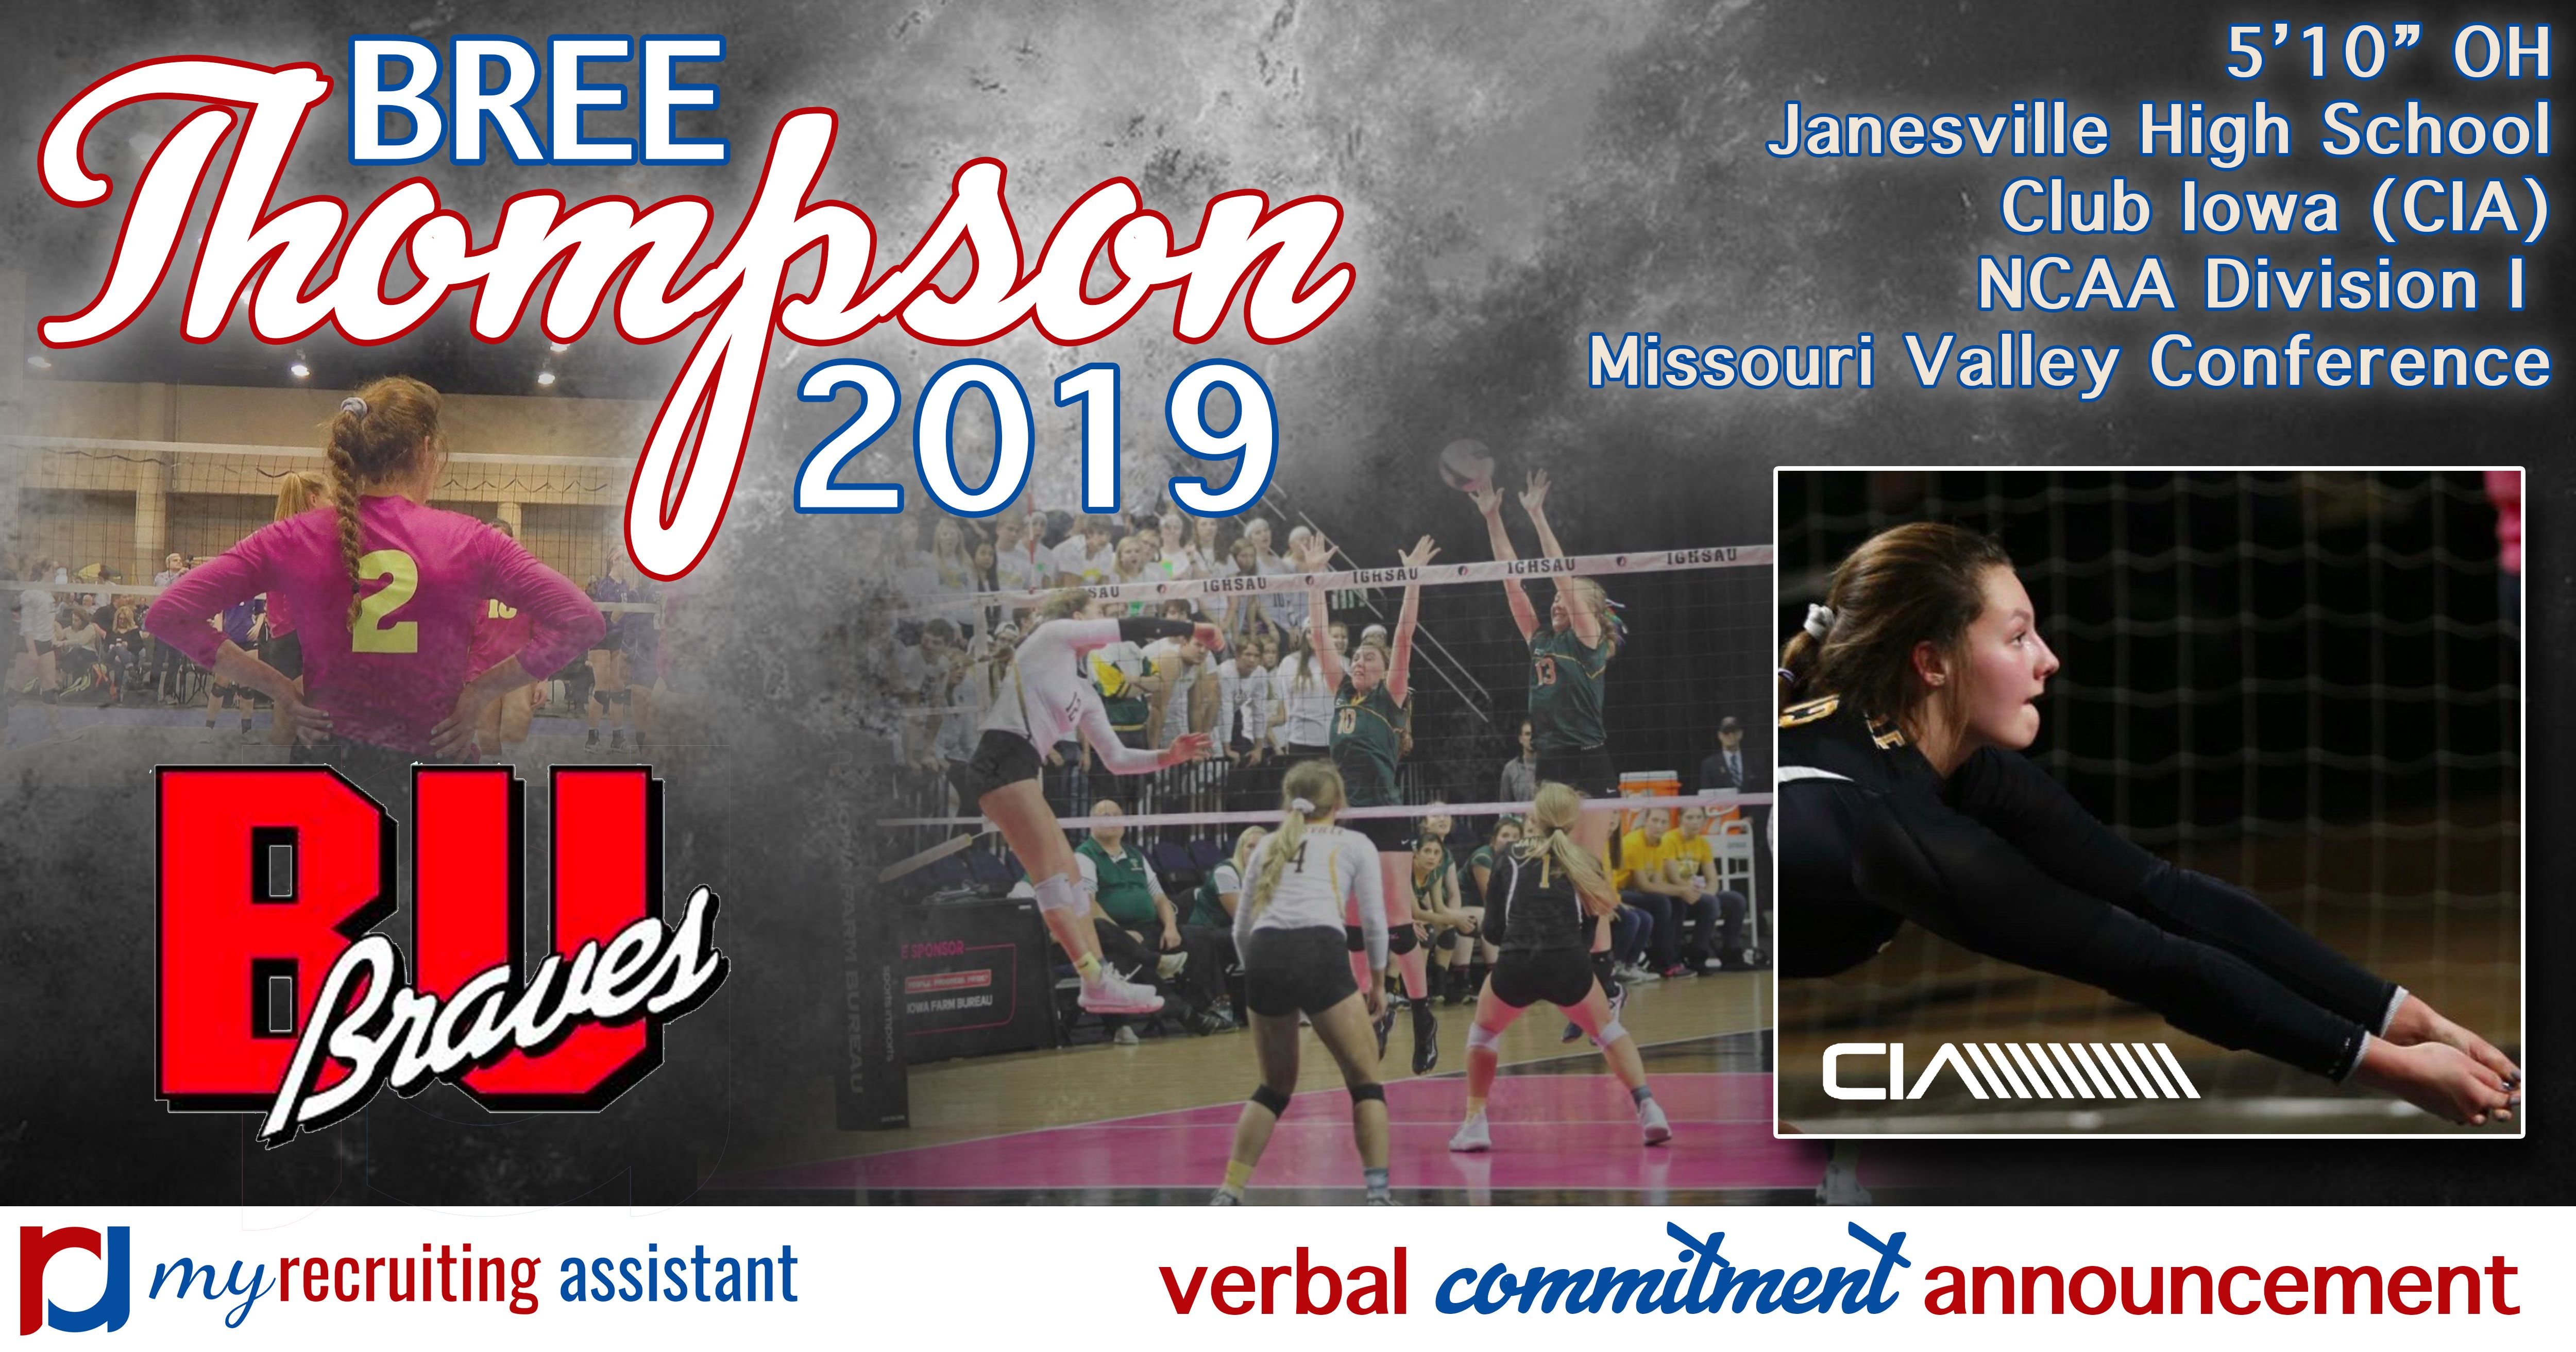 Class Of 2019 Ncaa Division I Bradley University Volleyball Commit Bradley University Missouri Valley Recruitment